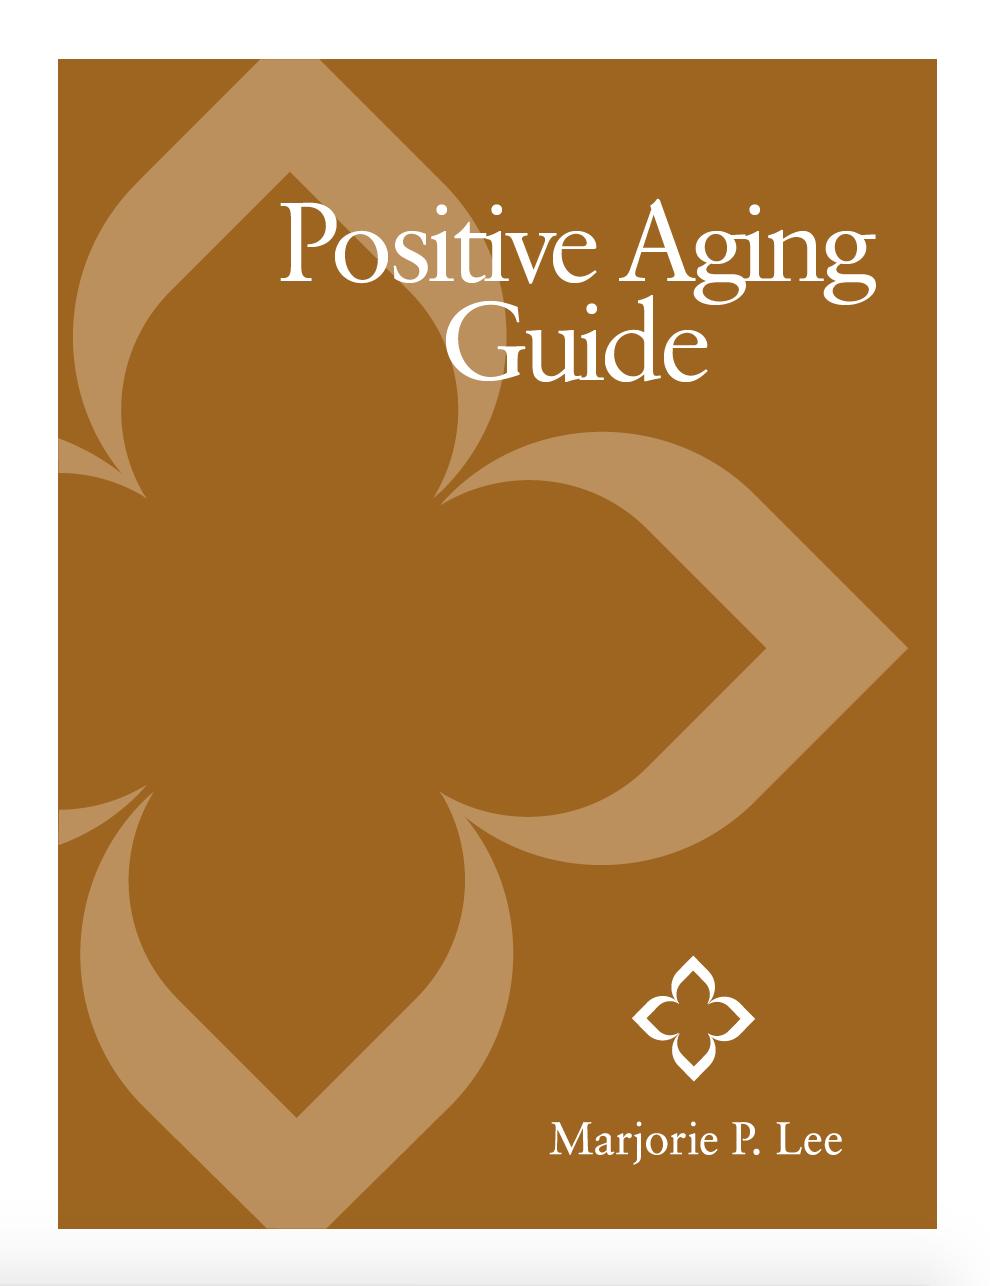 Positive Aging Guide - Marjorie P. Lee